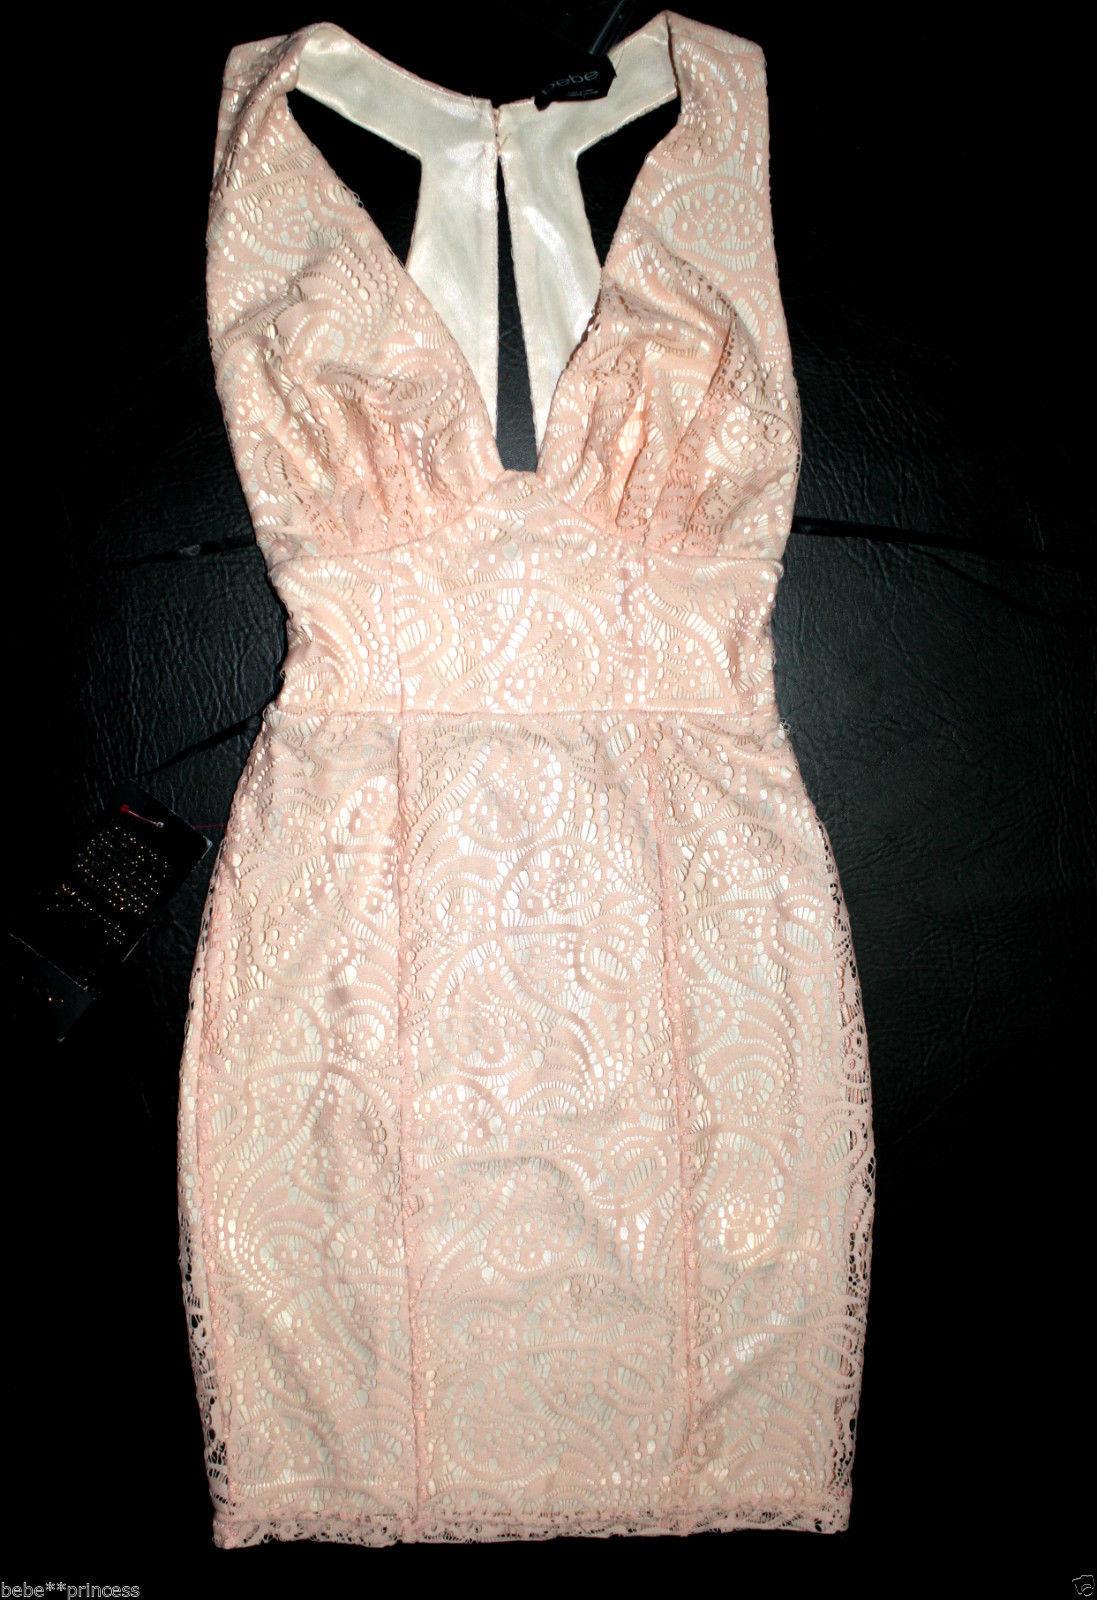 NWT bebe coral Rosa overlay lace deep v neck cutout top dress S Small 6